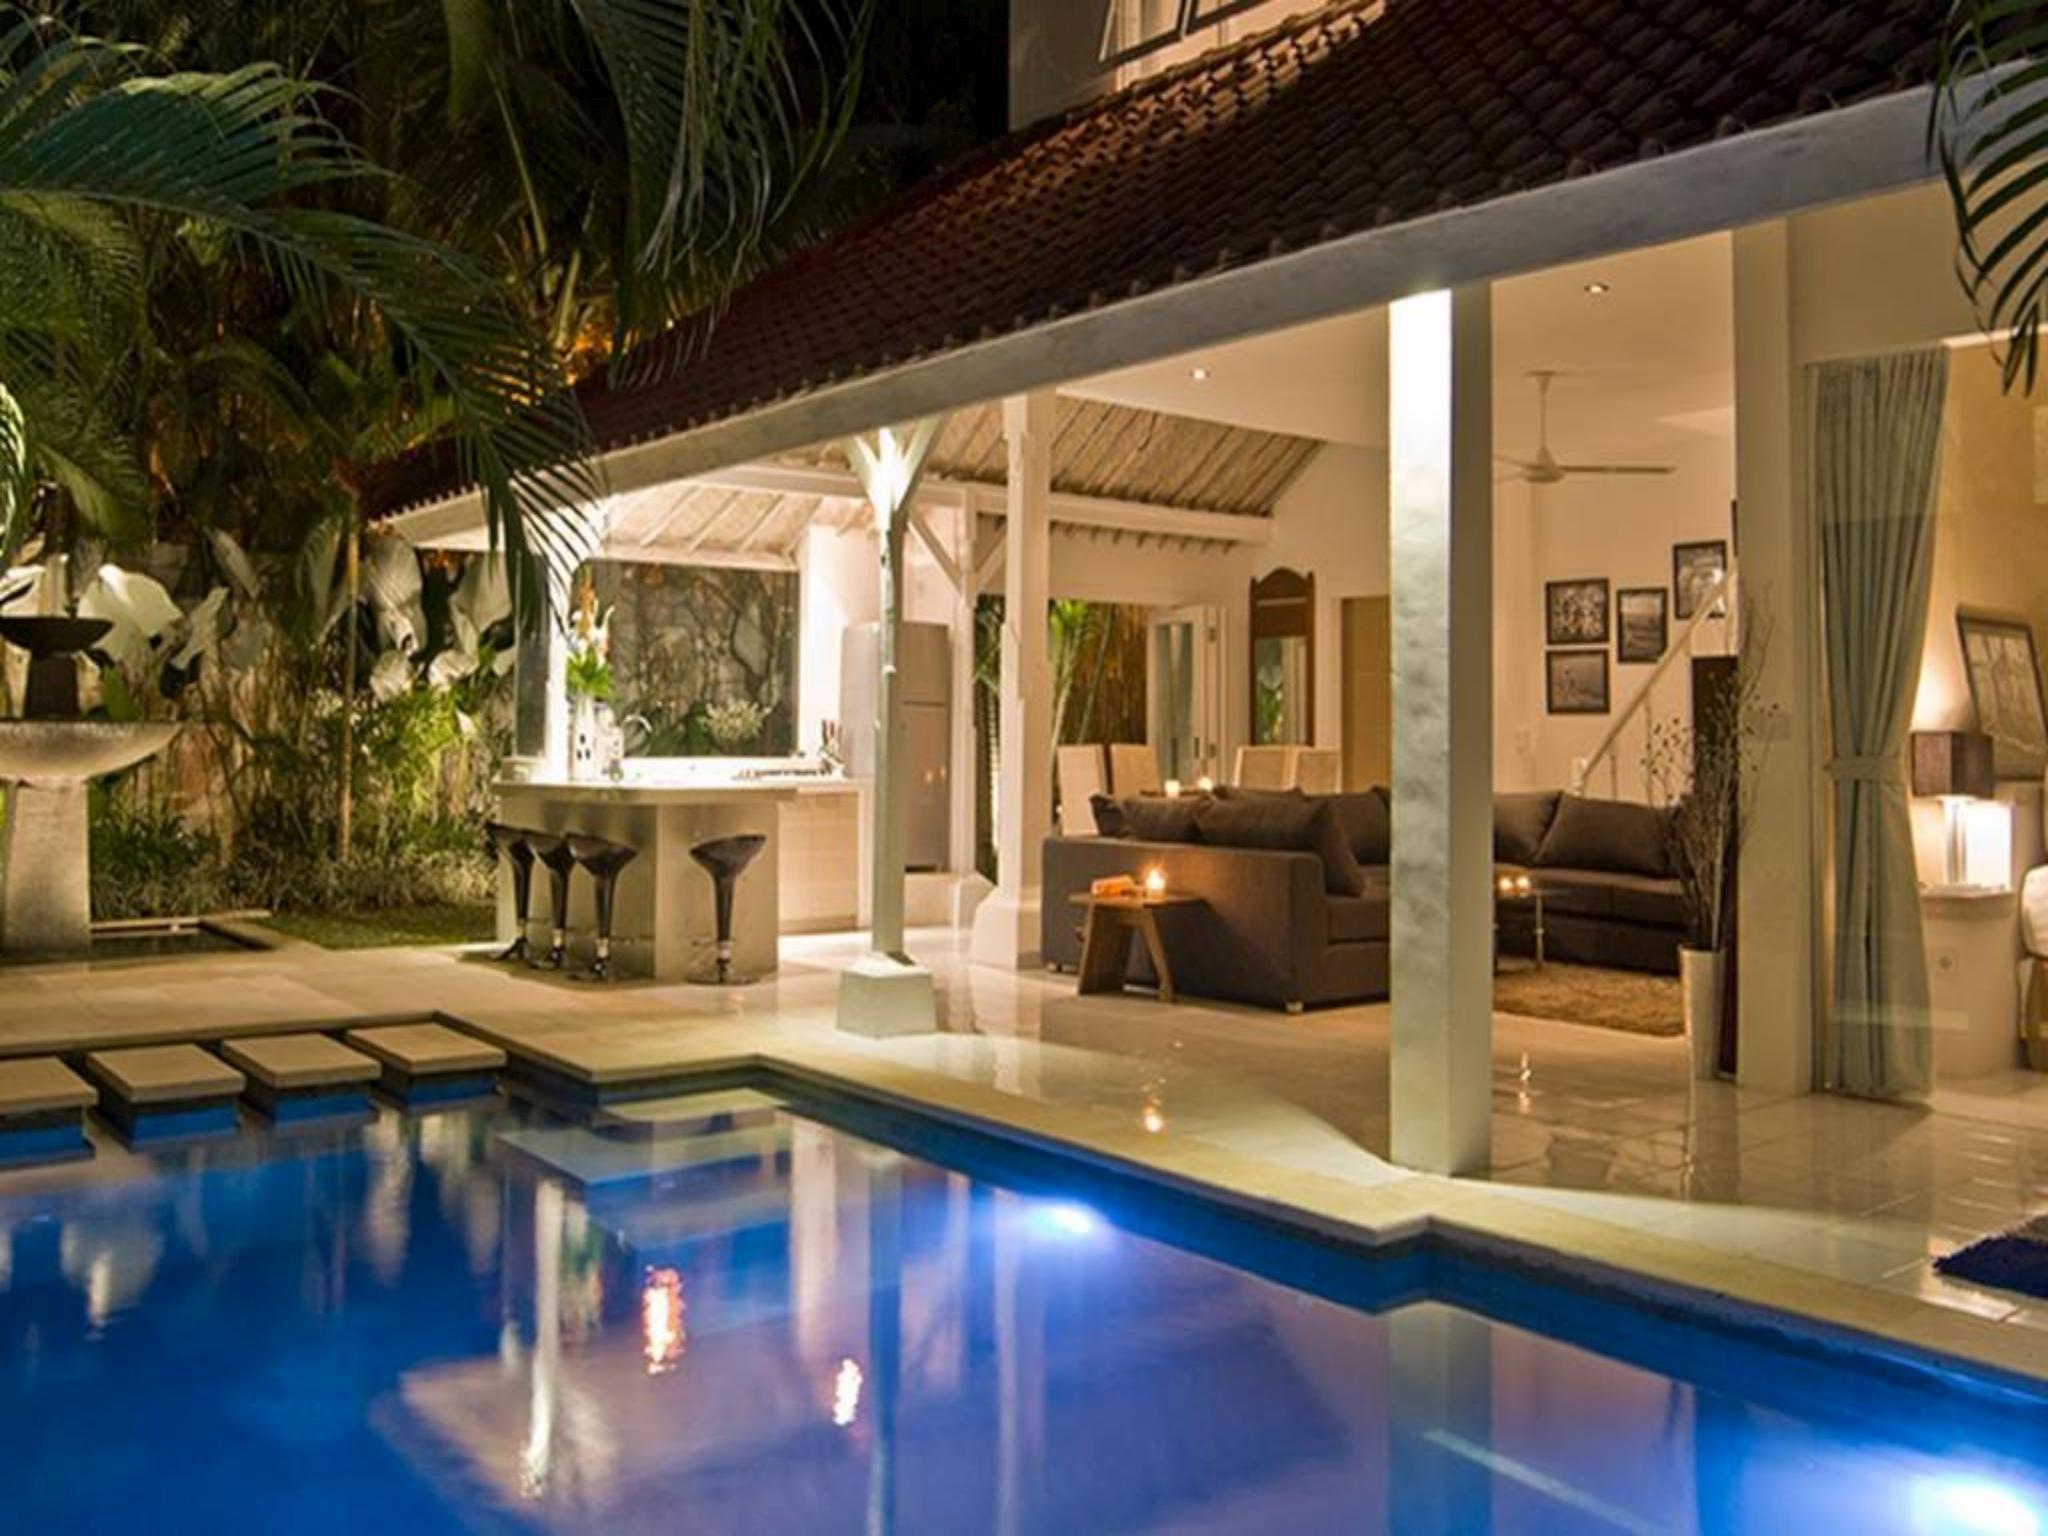 3 BDR Tropical Villa in Seminyak